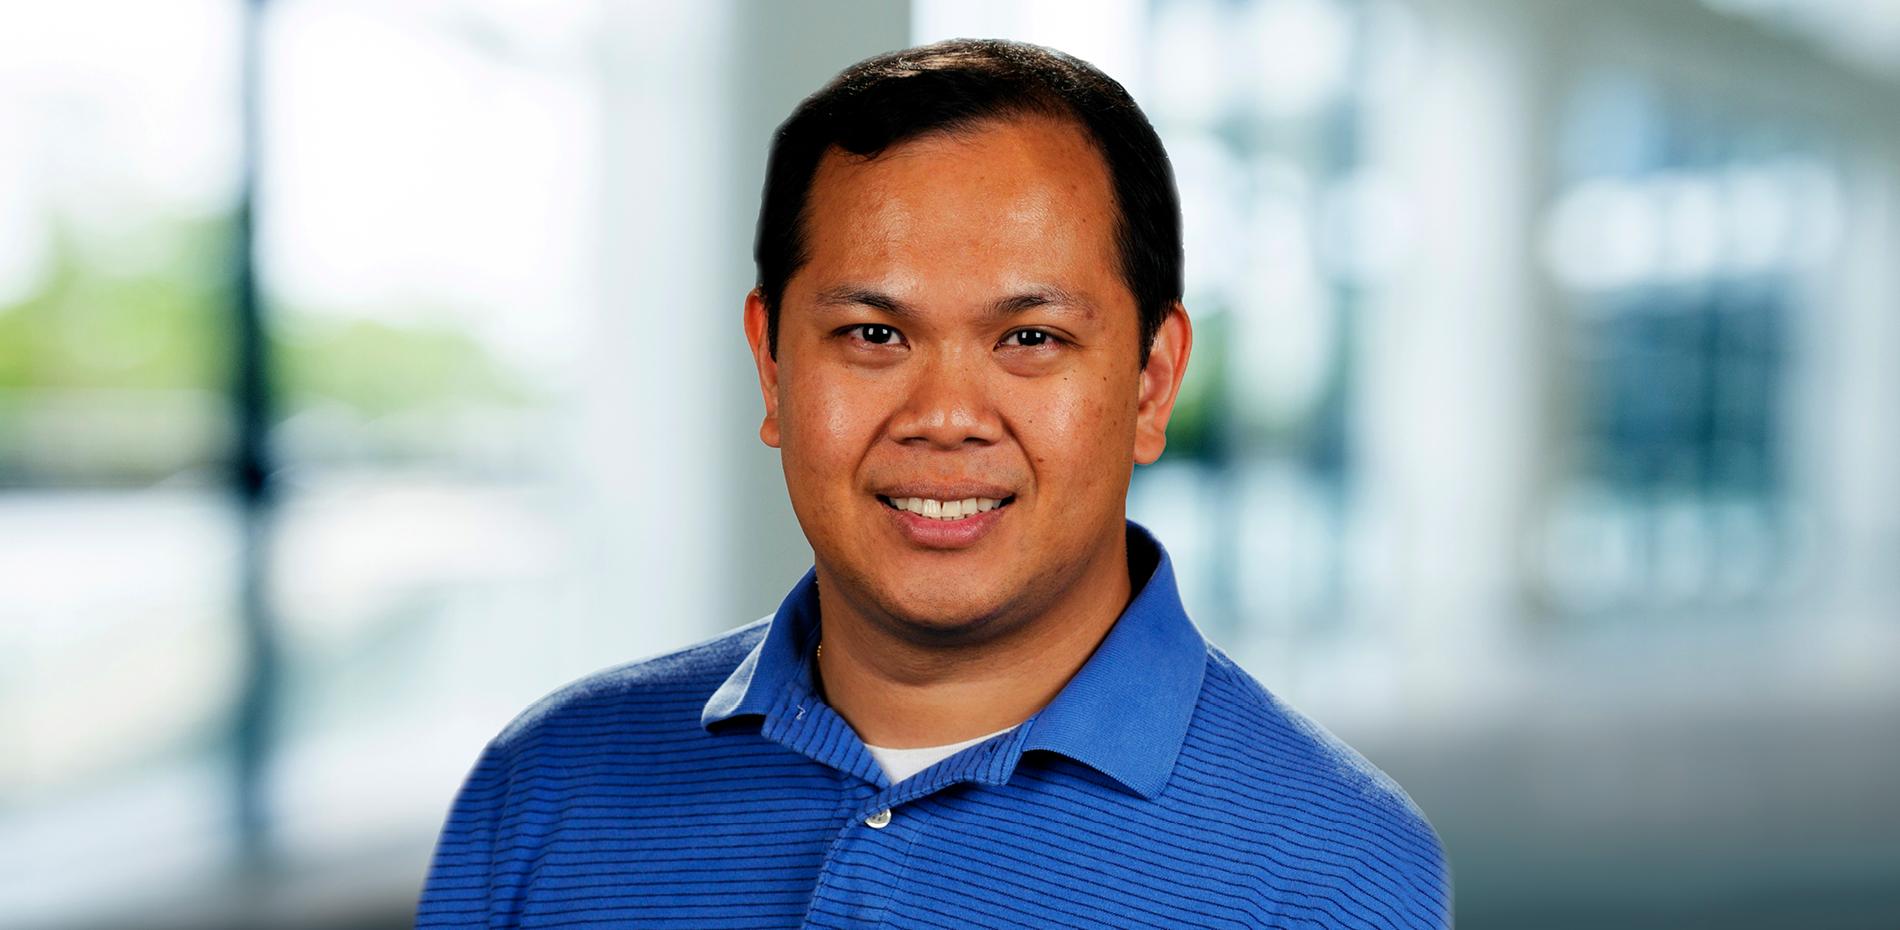 Bao Nyguen, online master in cybersecurity learner